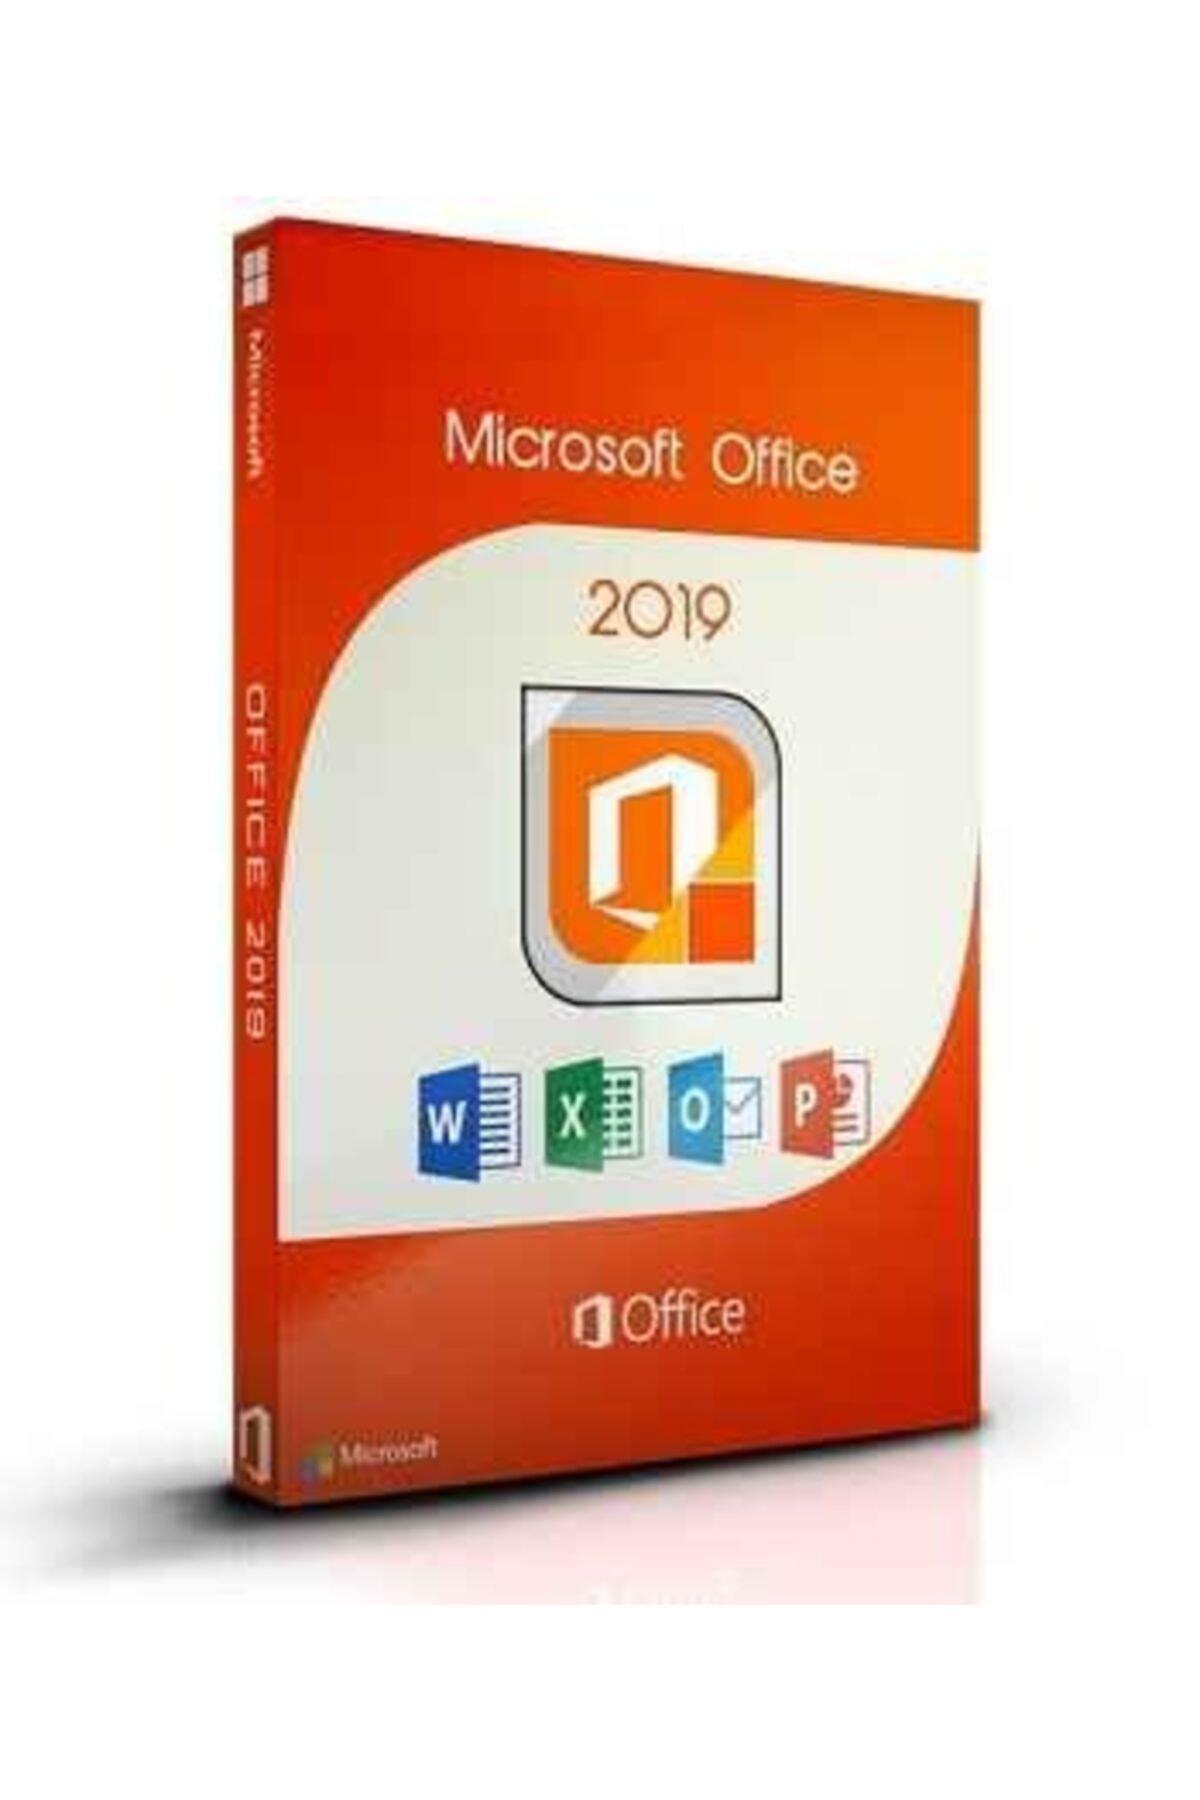 MICROSOFT Office 2019 Pro Plus Lisans Anahtarı - Retail Key 1